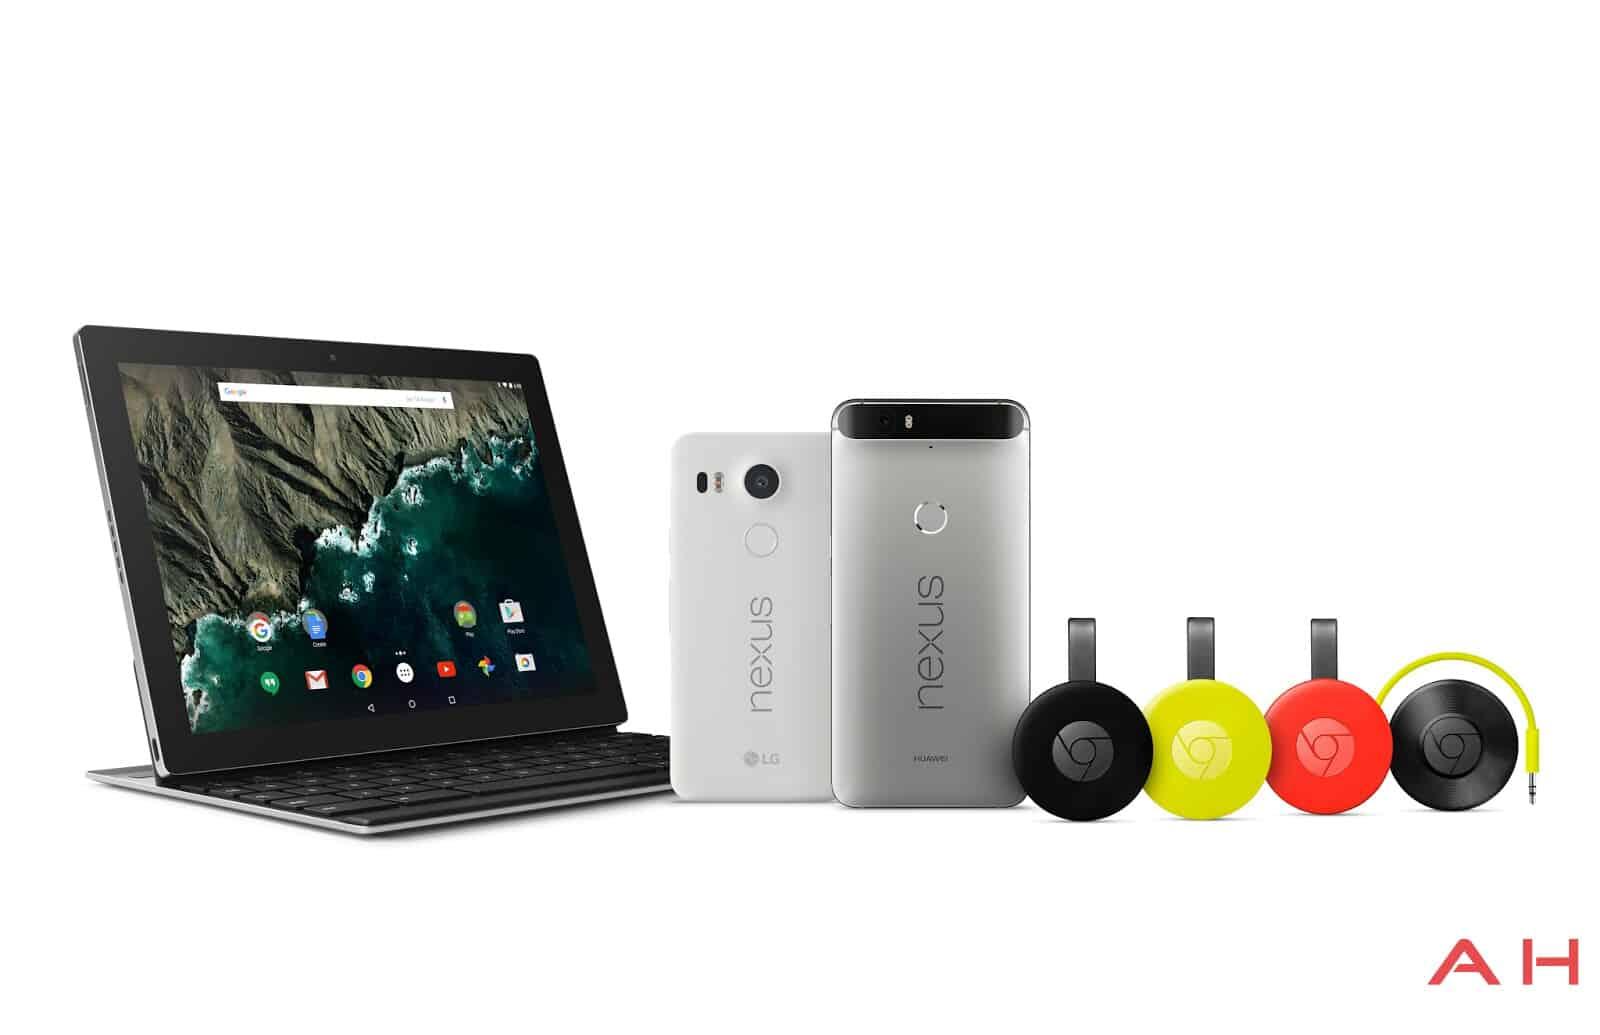 http://www.androidheadlines.com/wp-content/uploads/2015/09/AH-Nexus-5X-Nexus-6P-Chromecast-Chromecast-Audio-Pixel-C_11.jpg